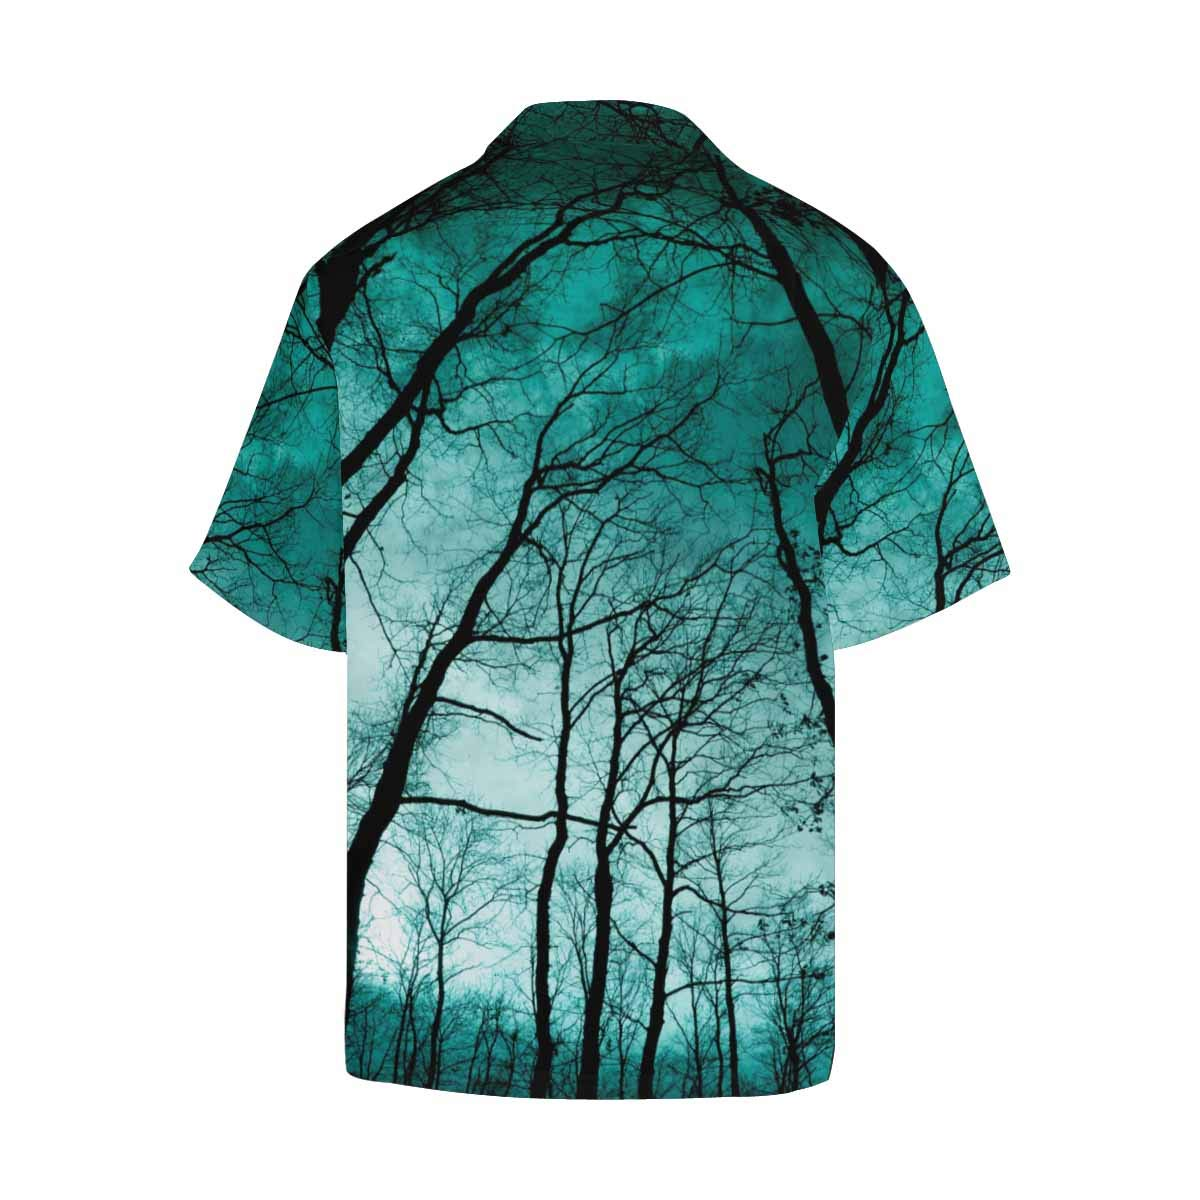 InterestPrint Mens Shirt Twilight in The Forest Mystic Nightscape Hawaiian T-Shirt for Men